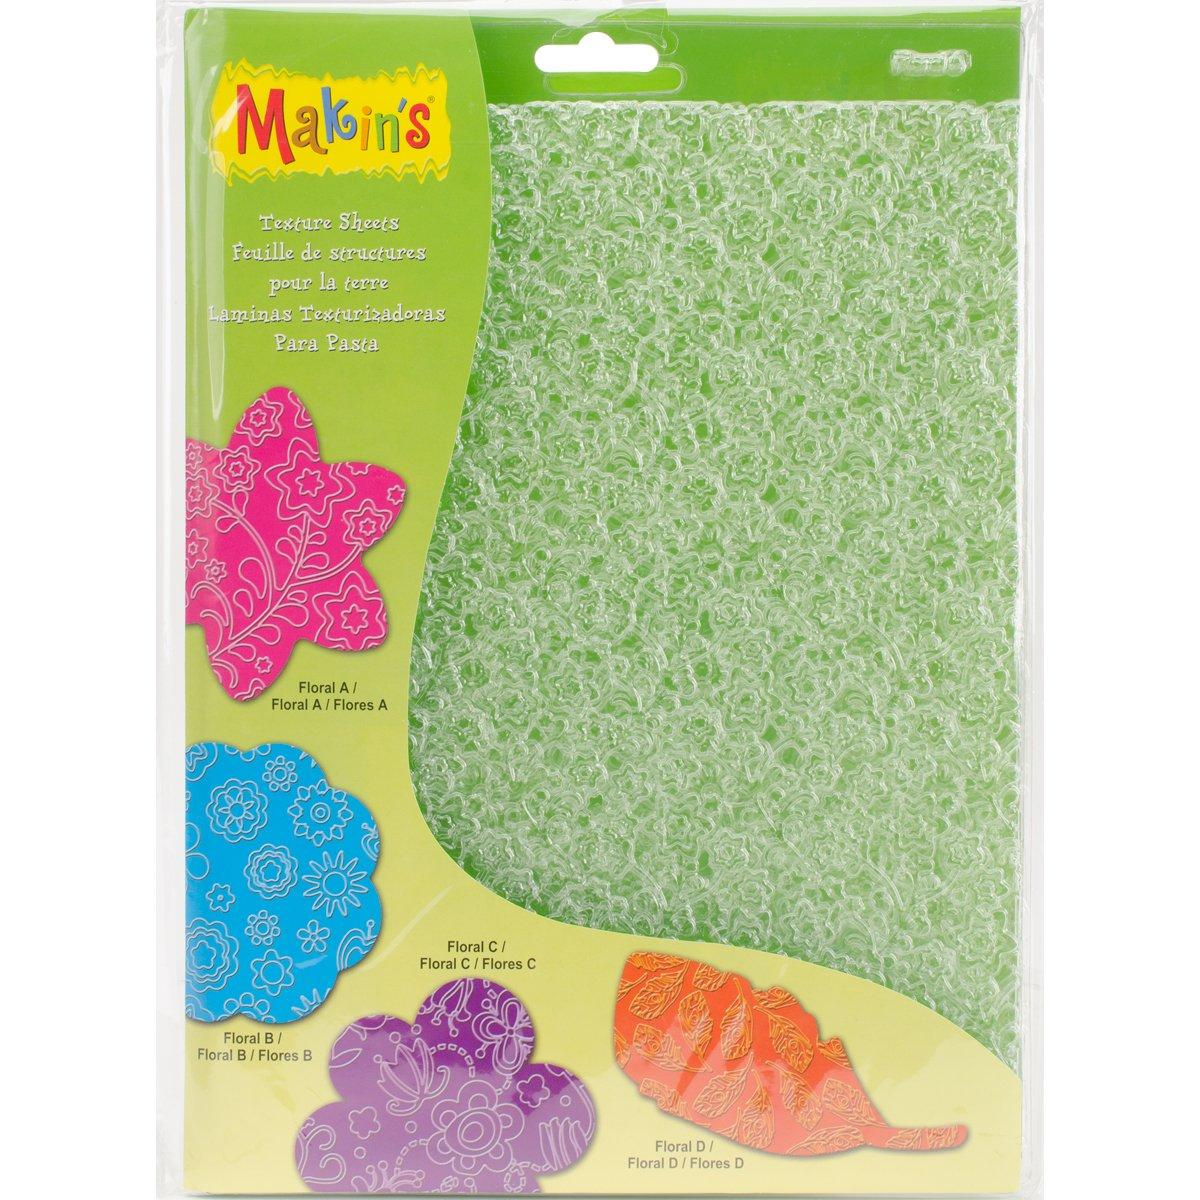 Makin's USA 38051 Feet s Clay Texture Sheet Sets 4/Pkg-Floral